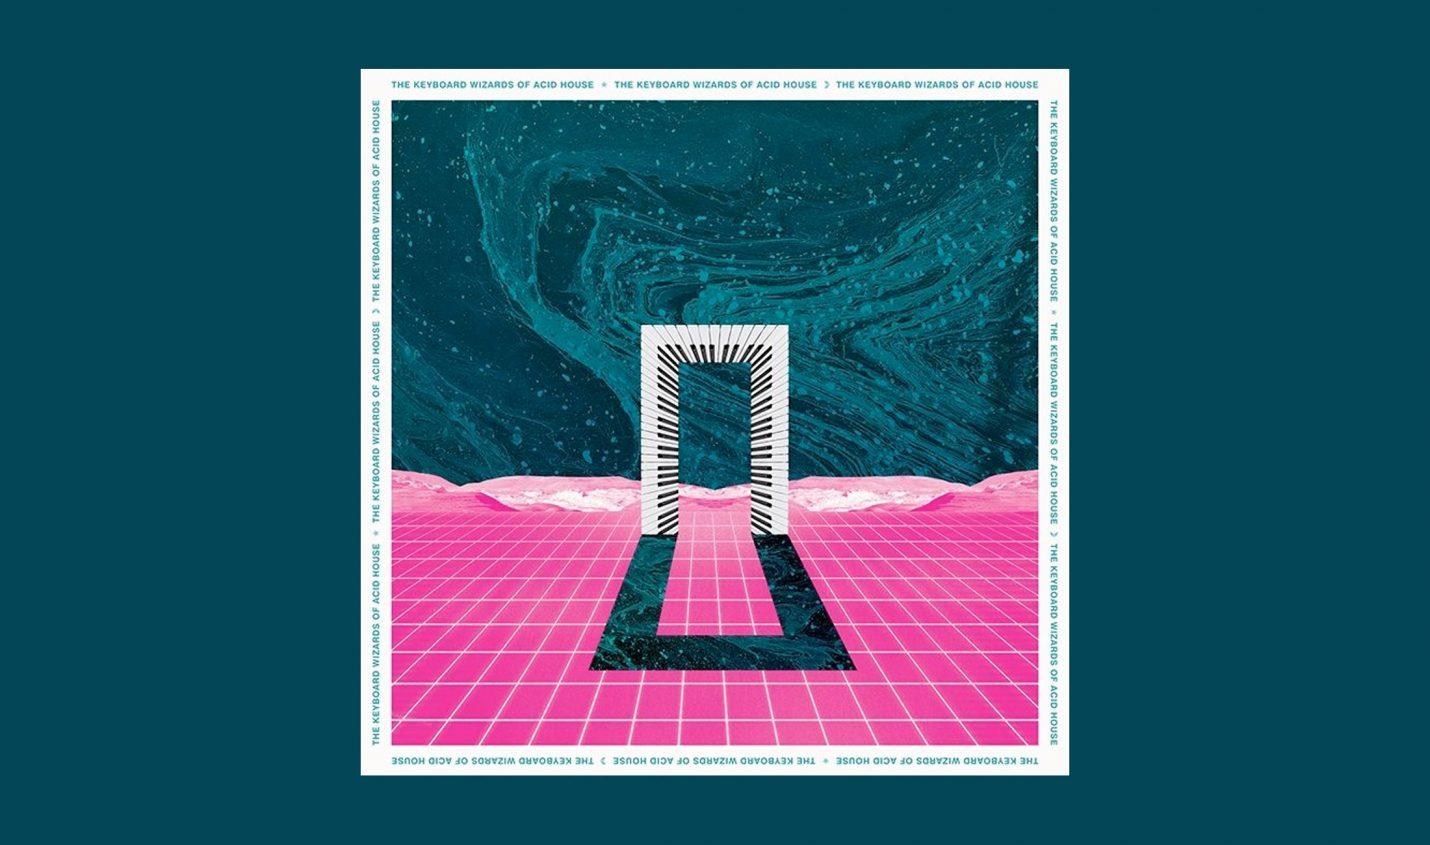 The Keyboard Wizards Of Acid House – neue Compilation mit Acid-Klassikern